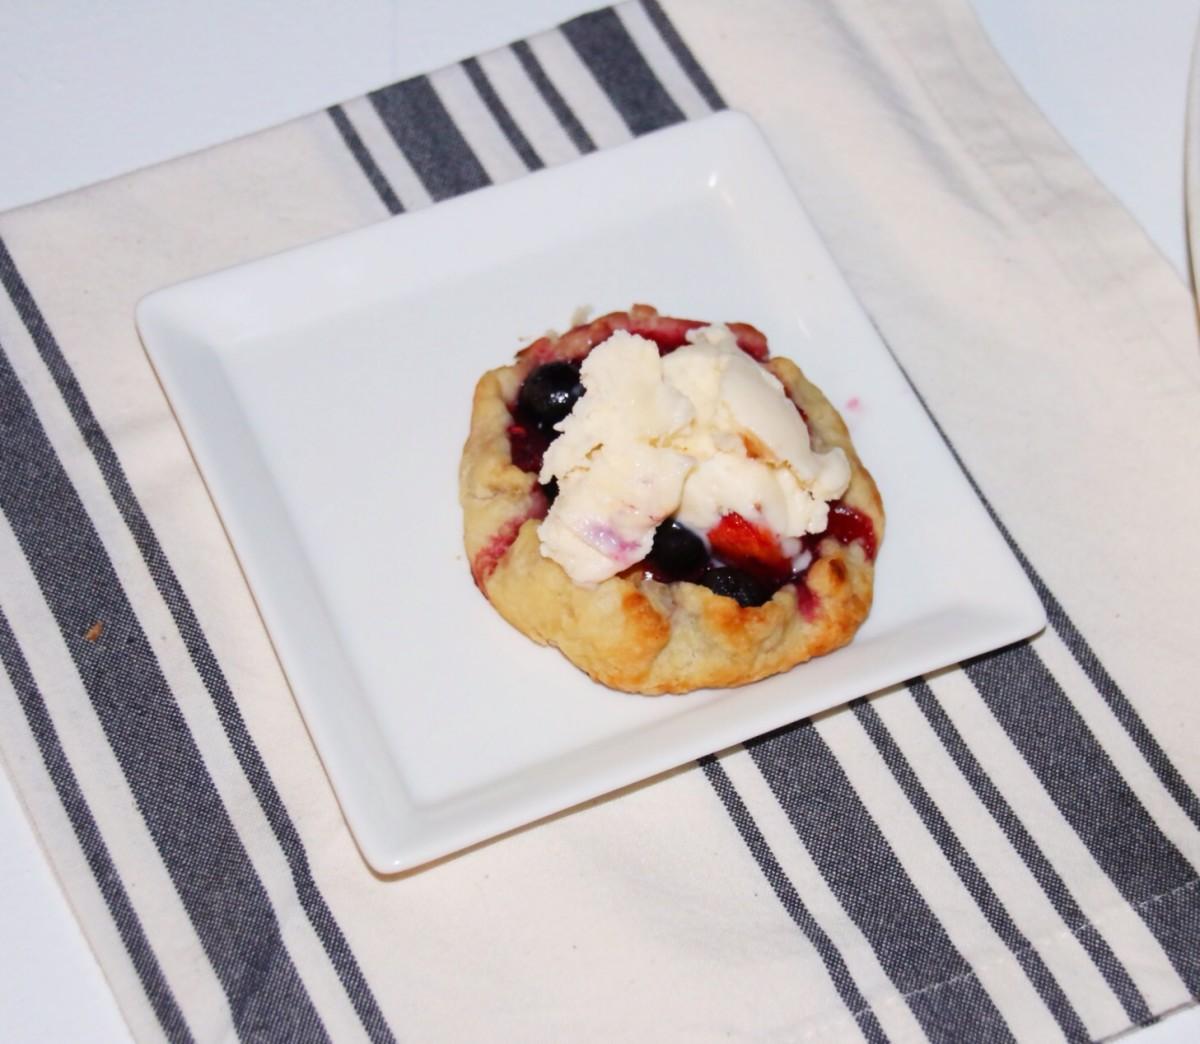 Lillet  dessert